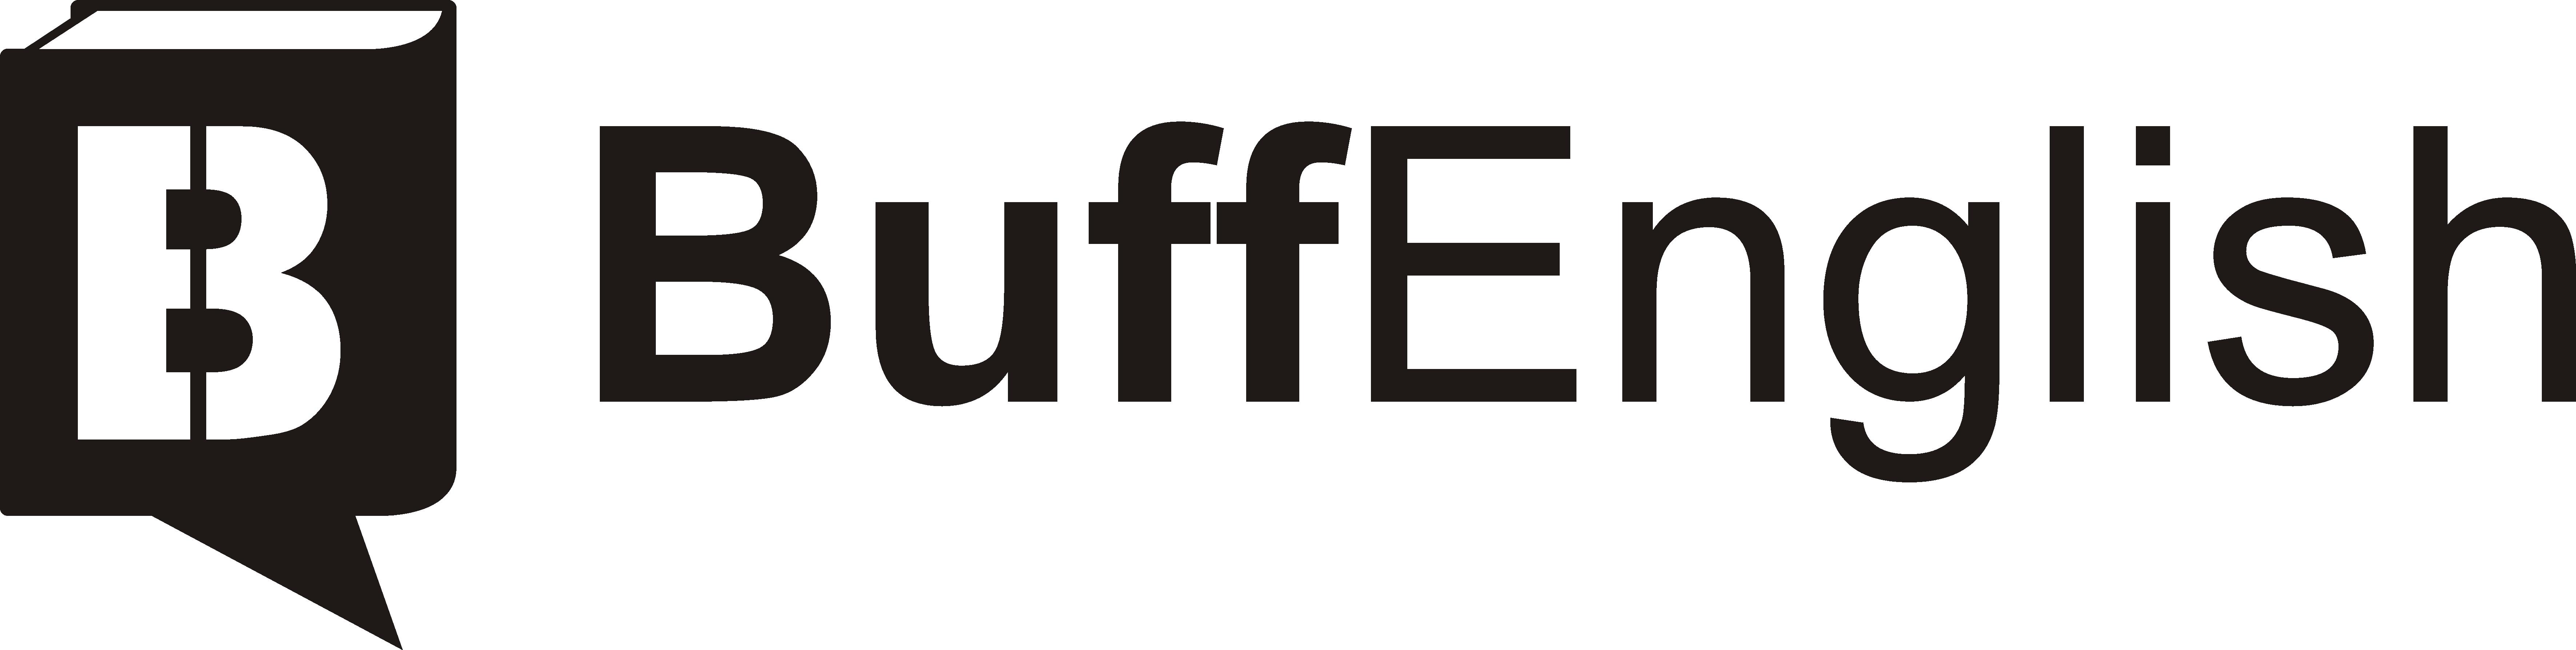 Literature-based education brand needs fun logo